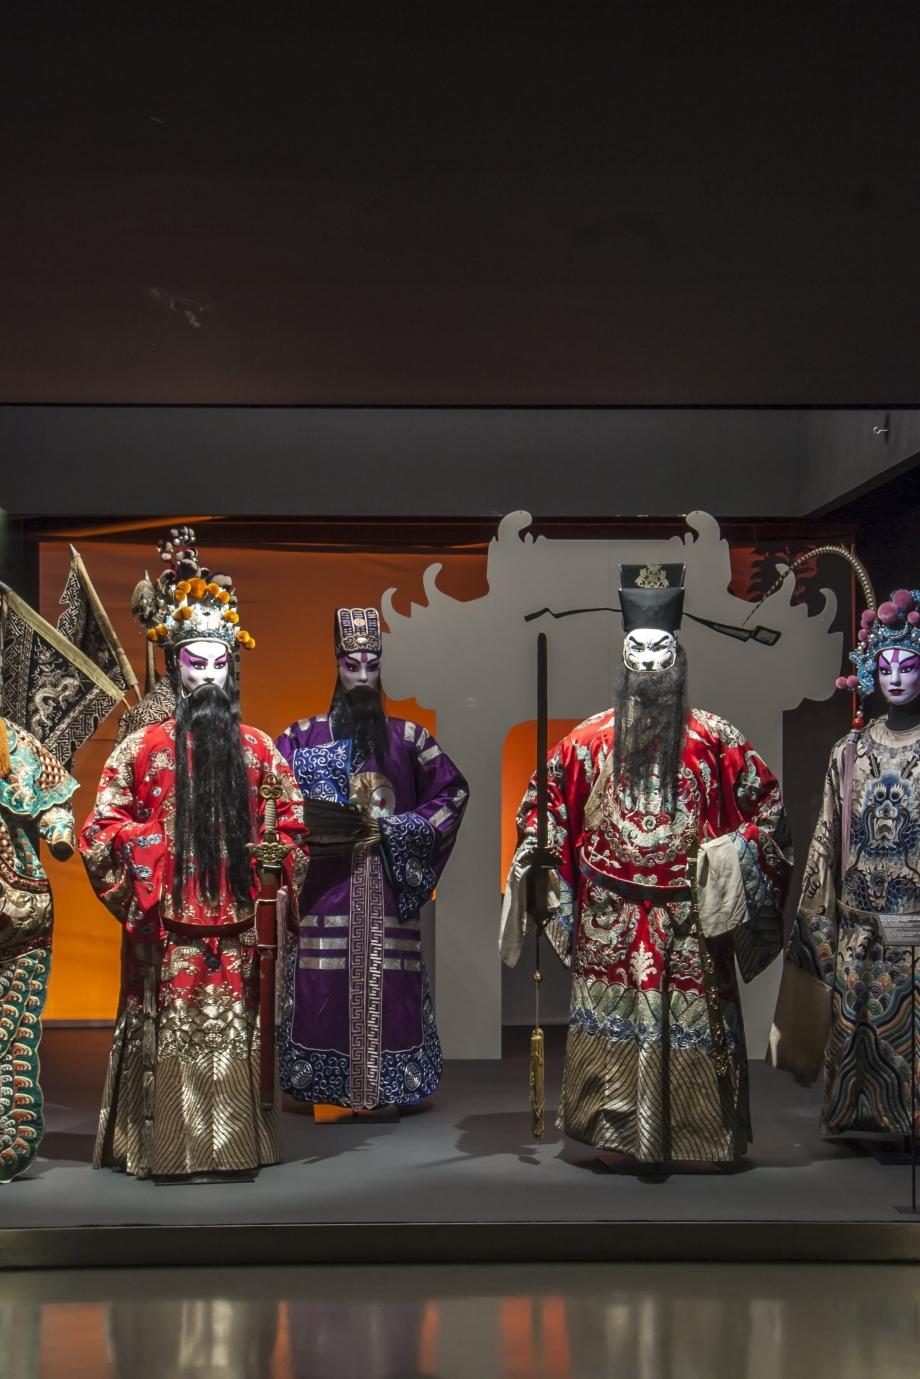 LC_Blog_Museu do Oriente Opera Chinesa